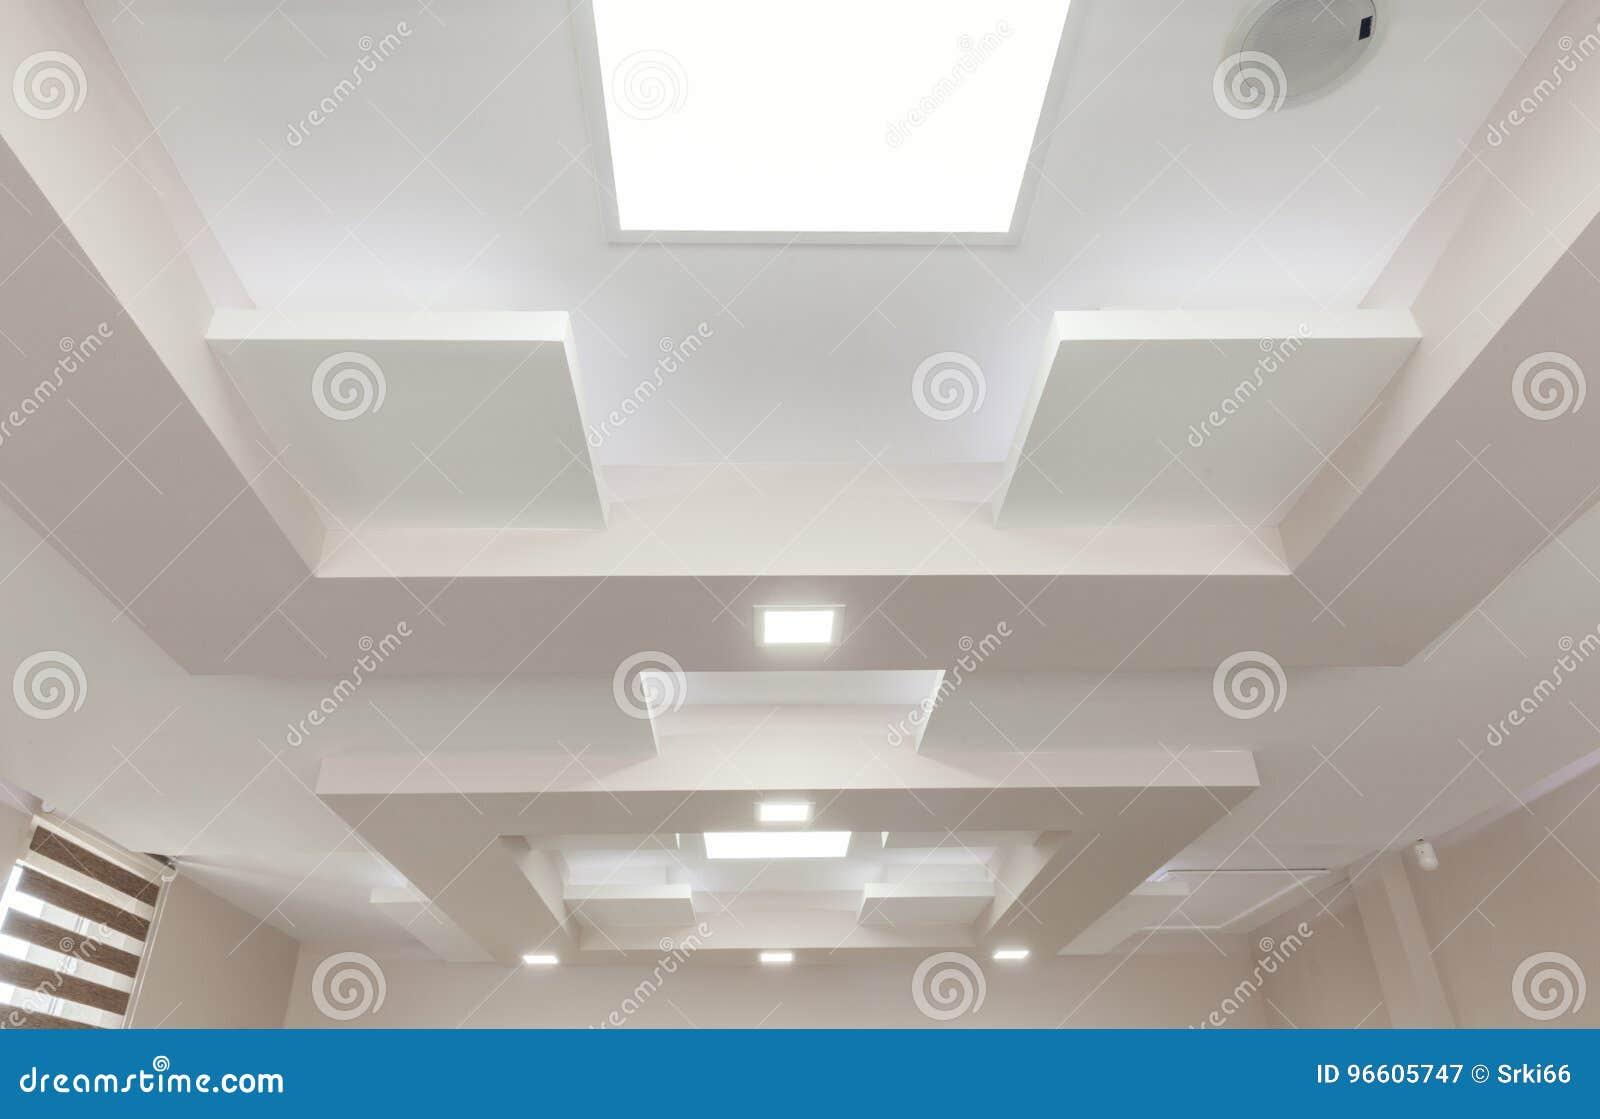 Suspended ceiling Grilyato: description, installation technology 38